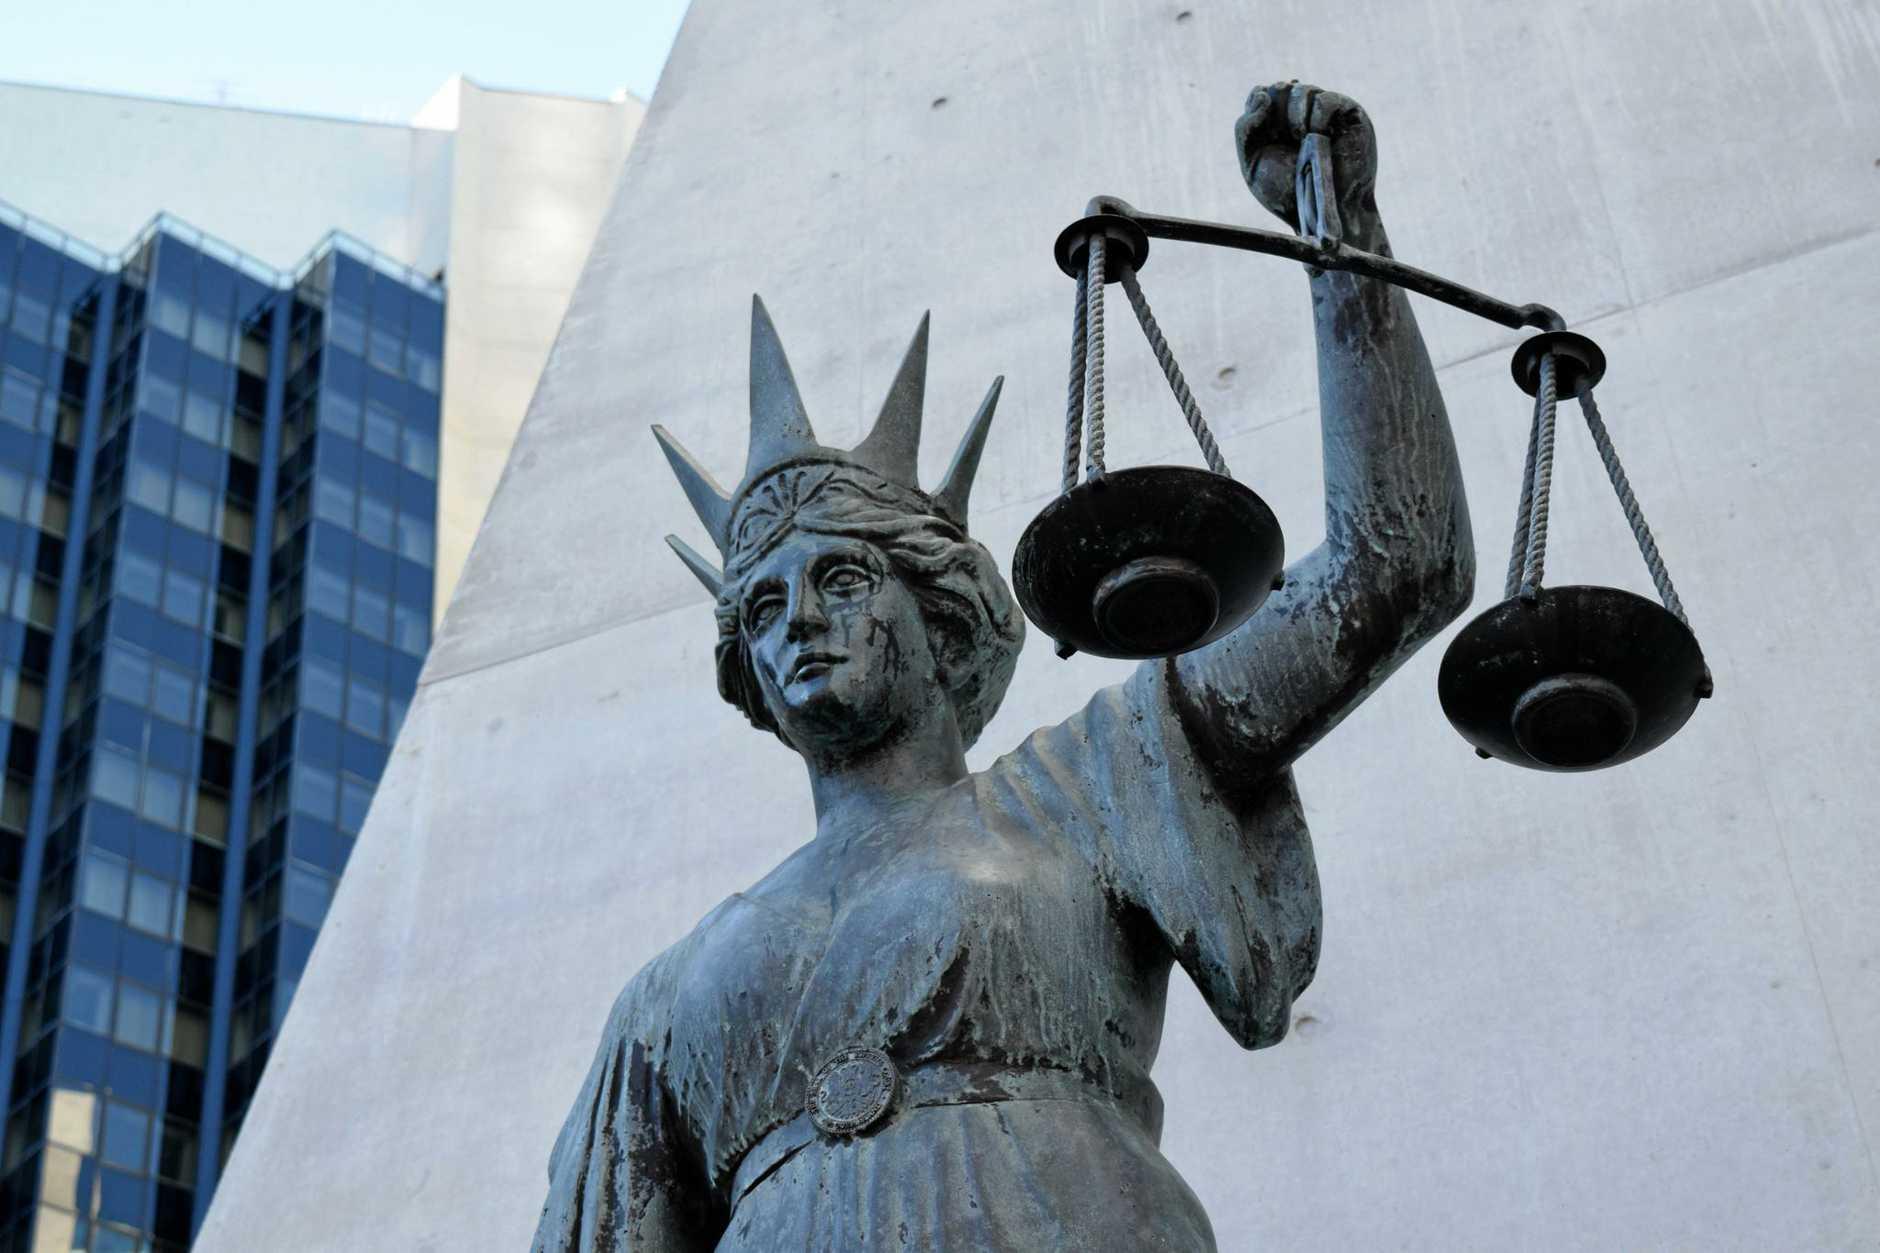 A Sunshine Coast drug dealer says his trial was flawed.